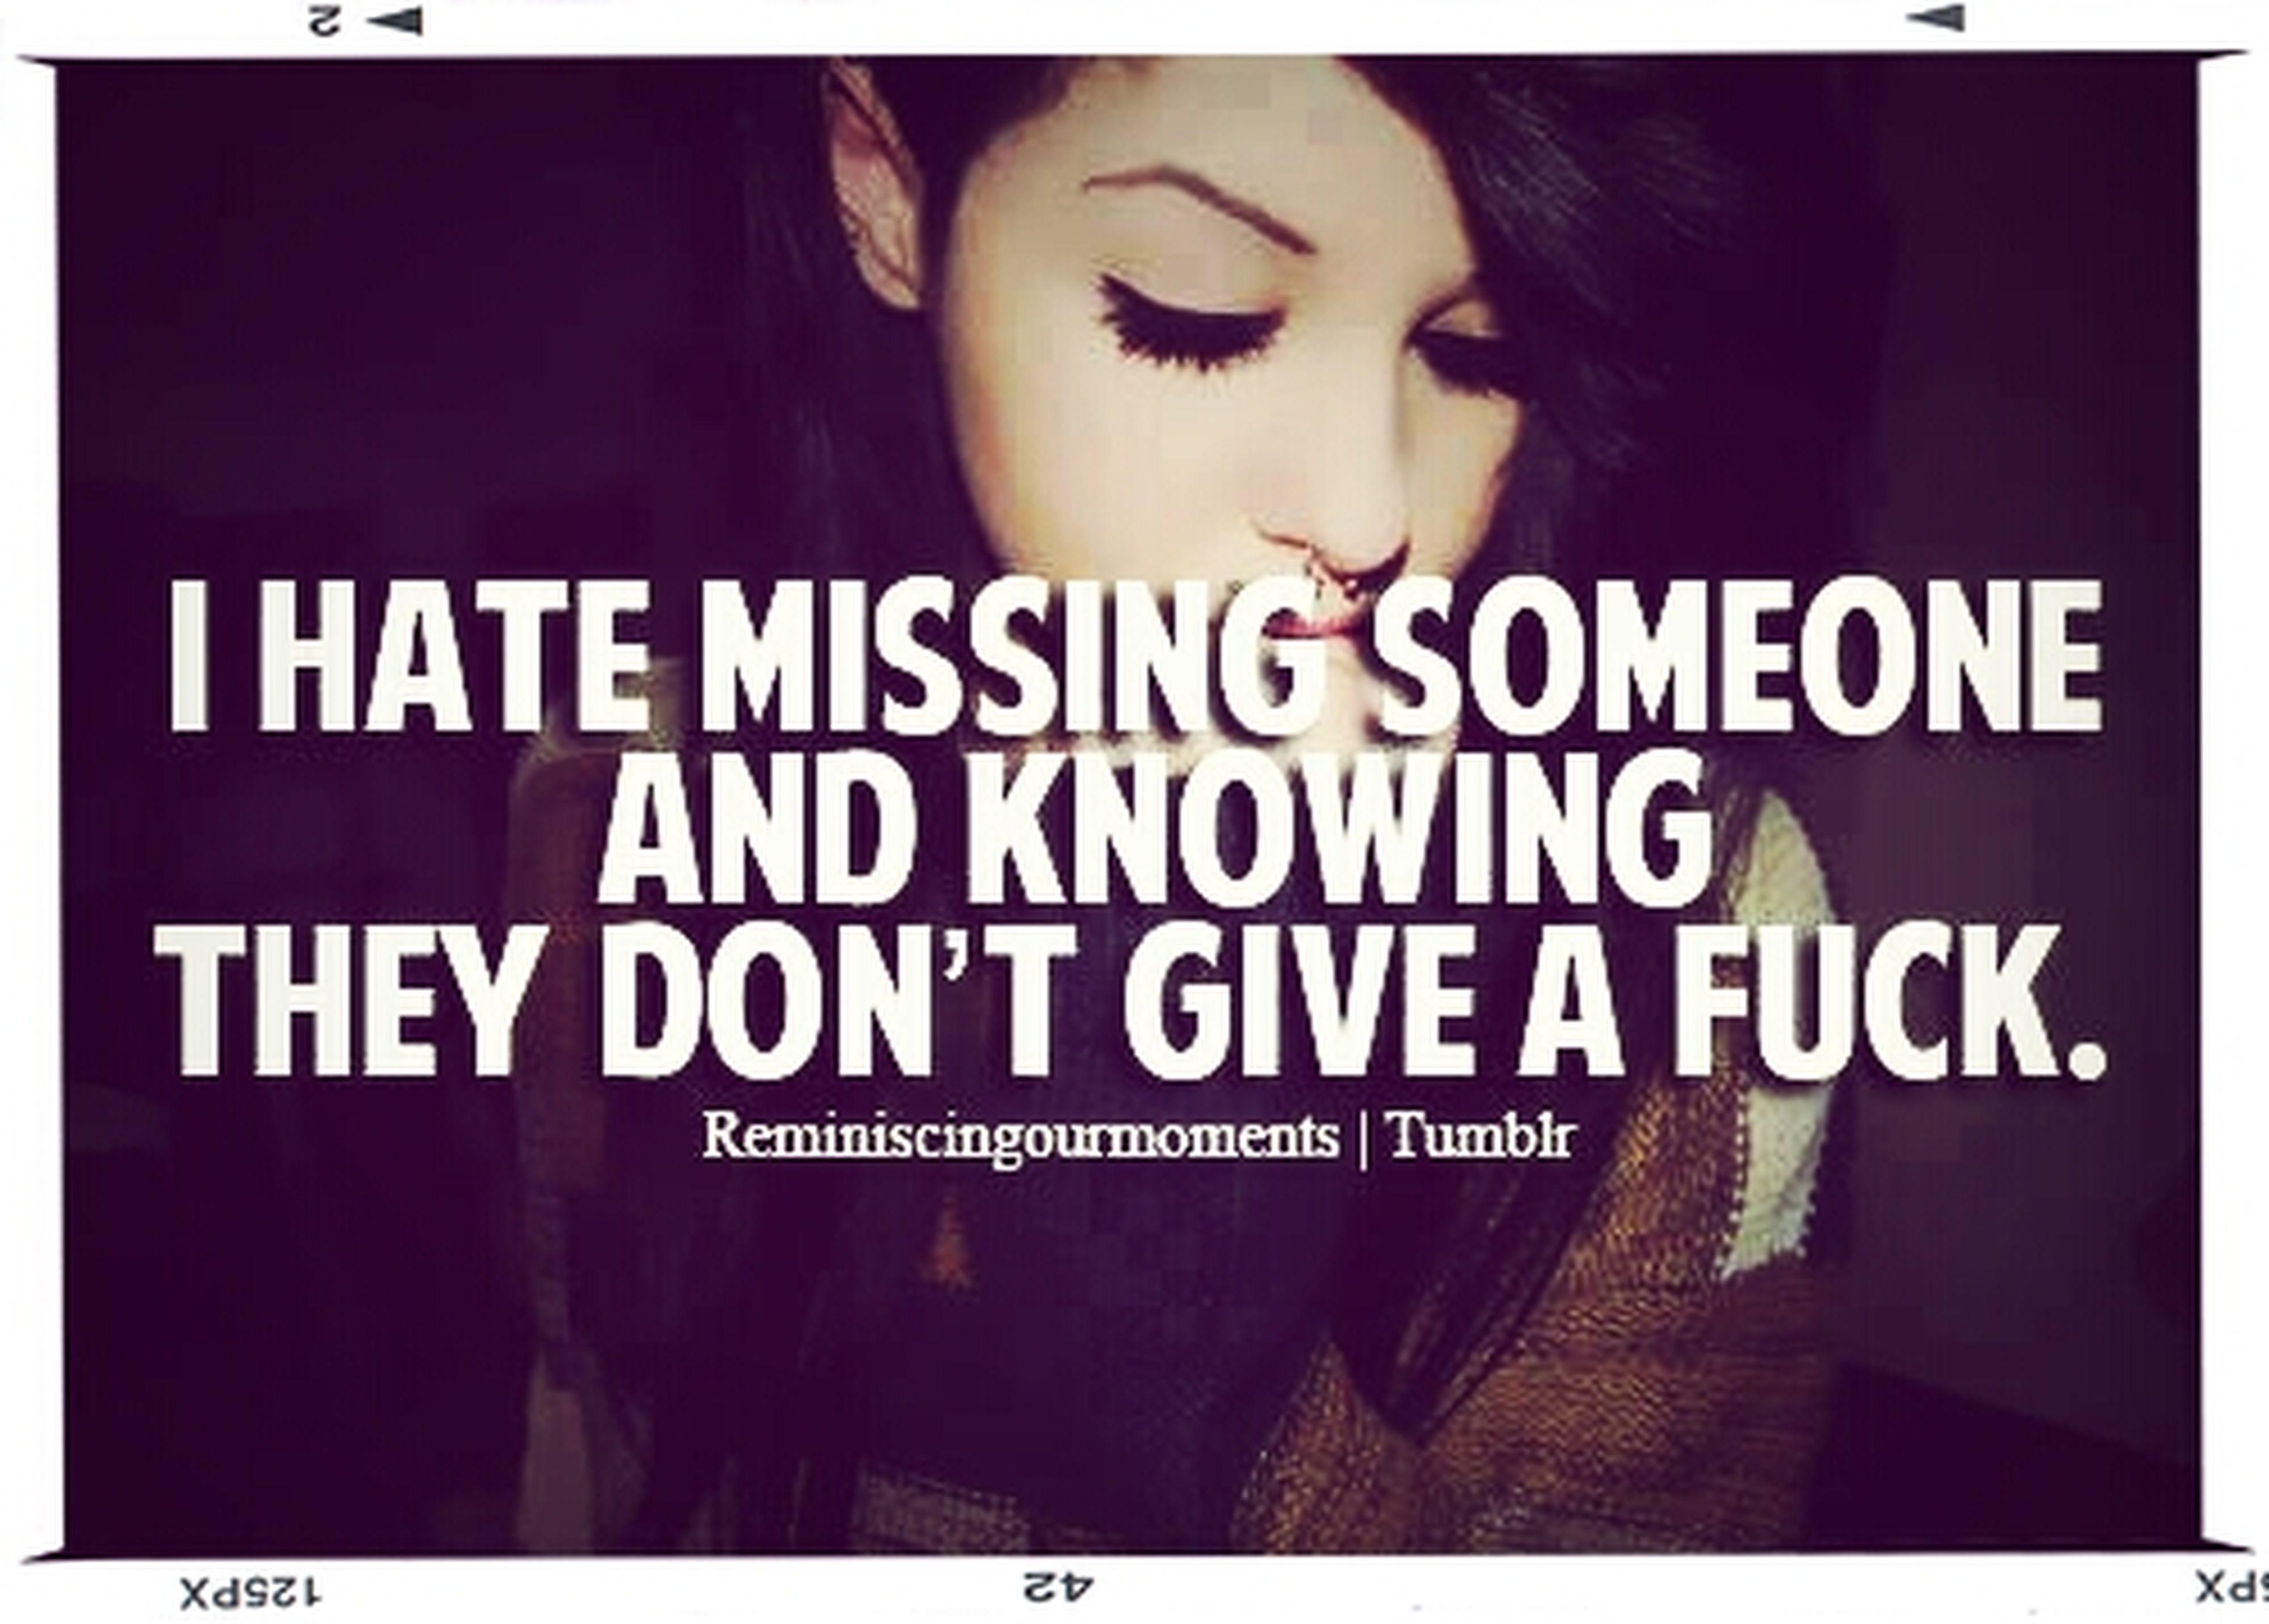 I Feel Like This :/